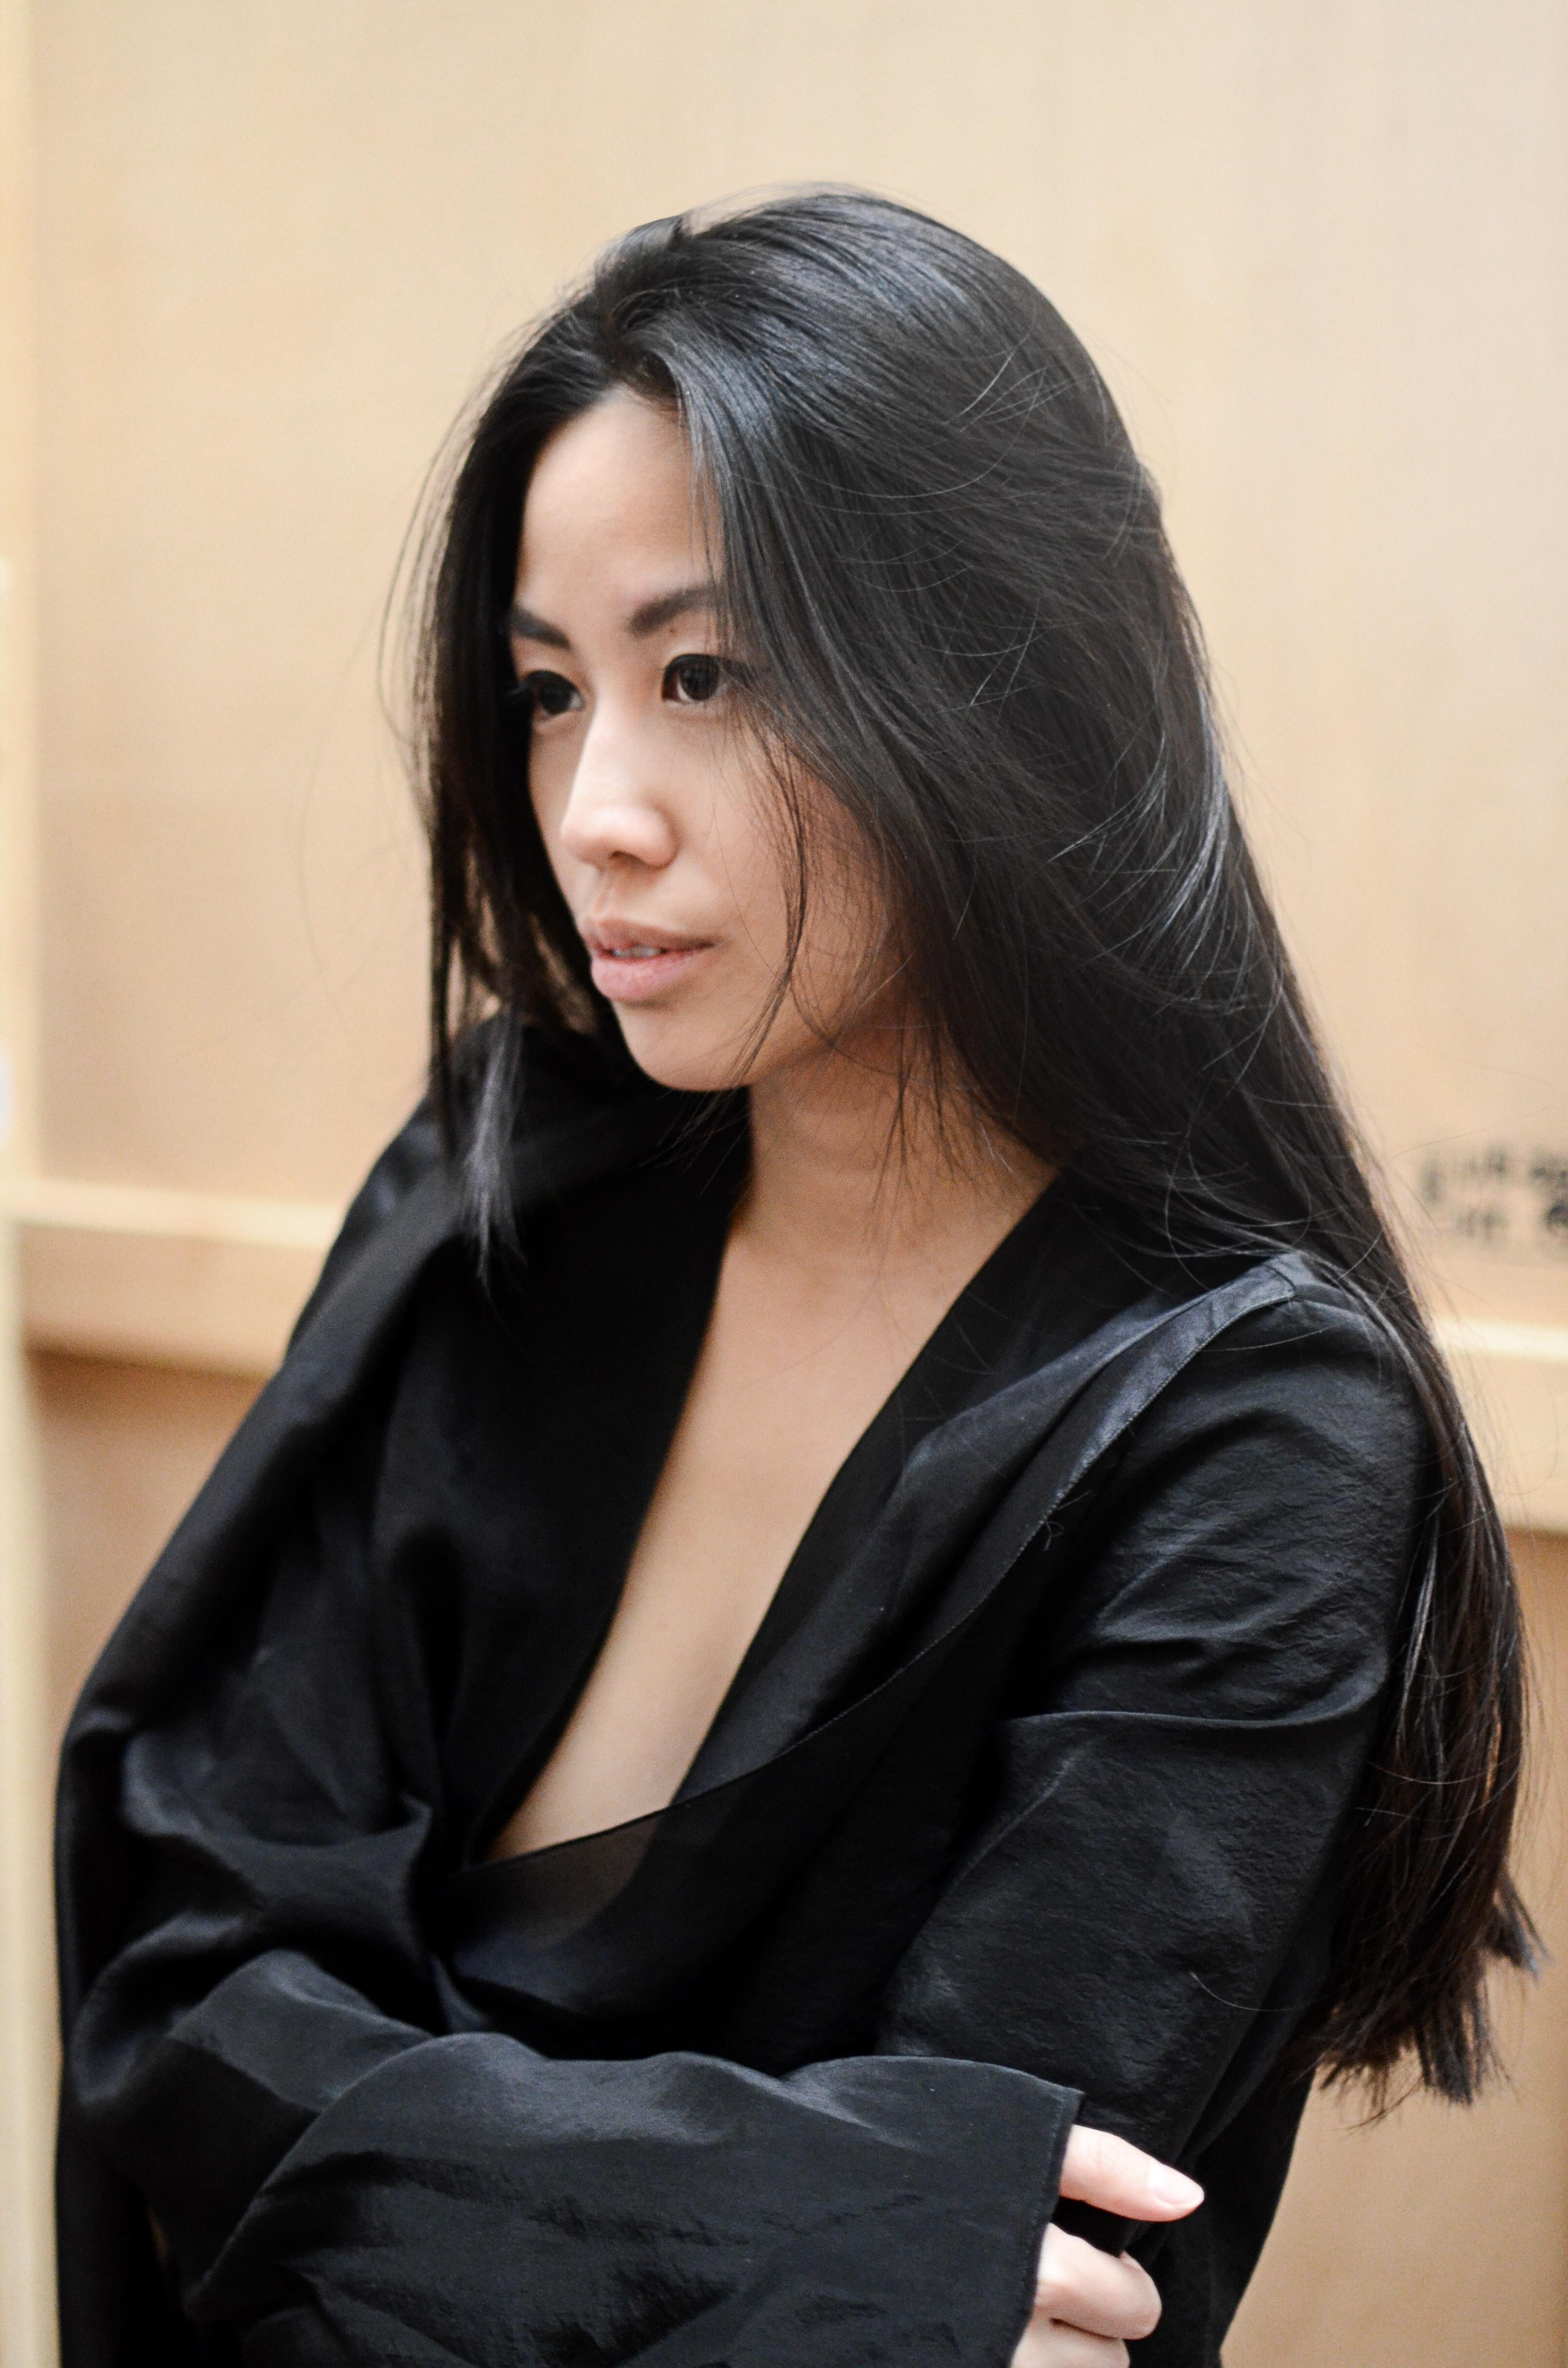 alice_m_huynh_black_silk_blouse_03